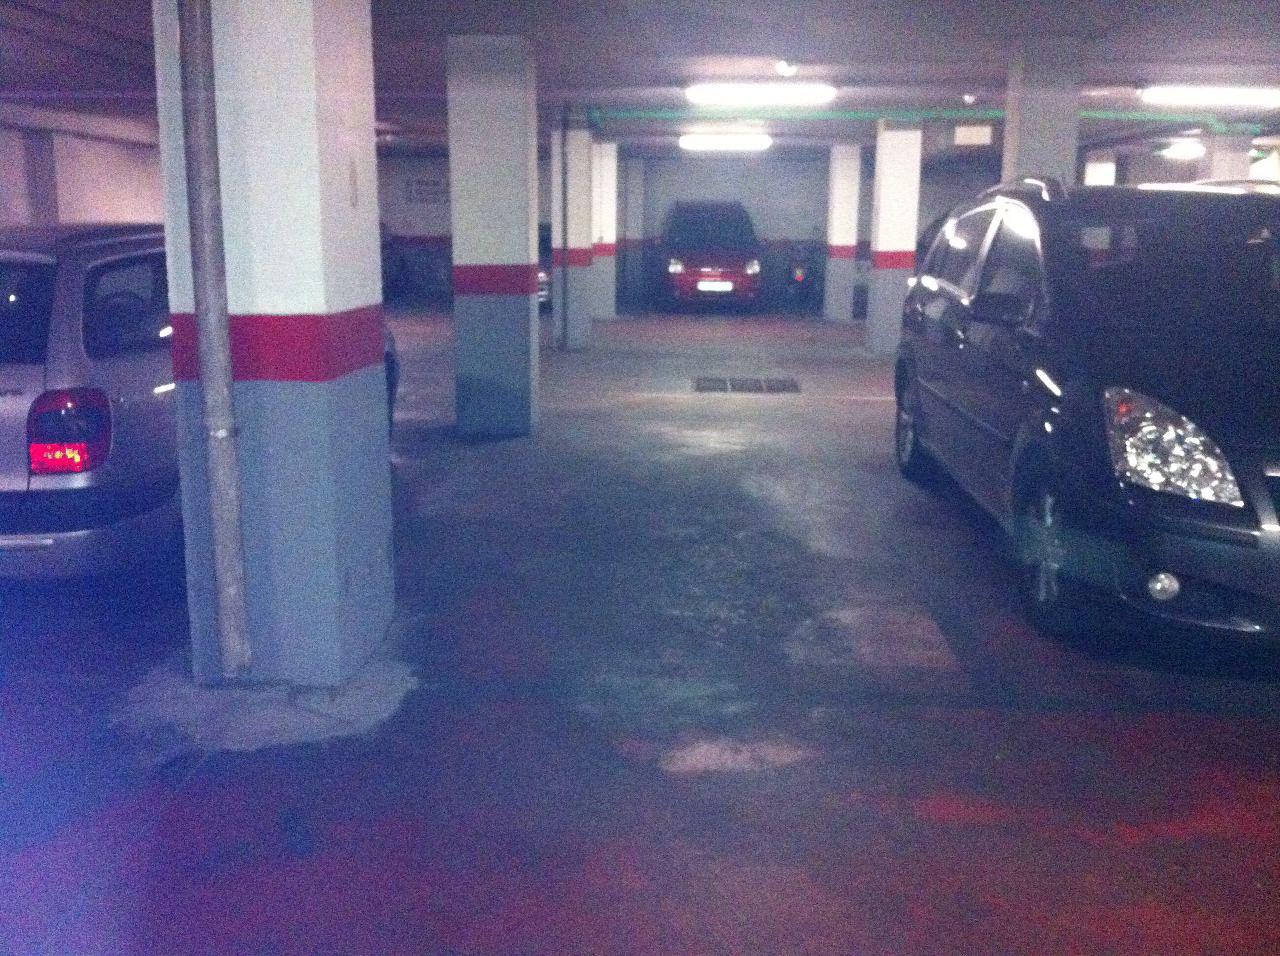 Alquiler Parking coche  Calle andreu feliu, 21